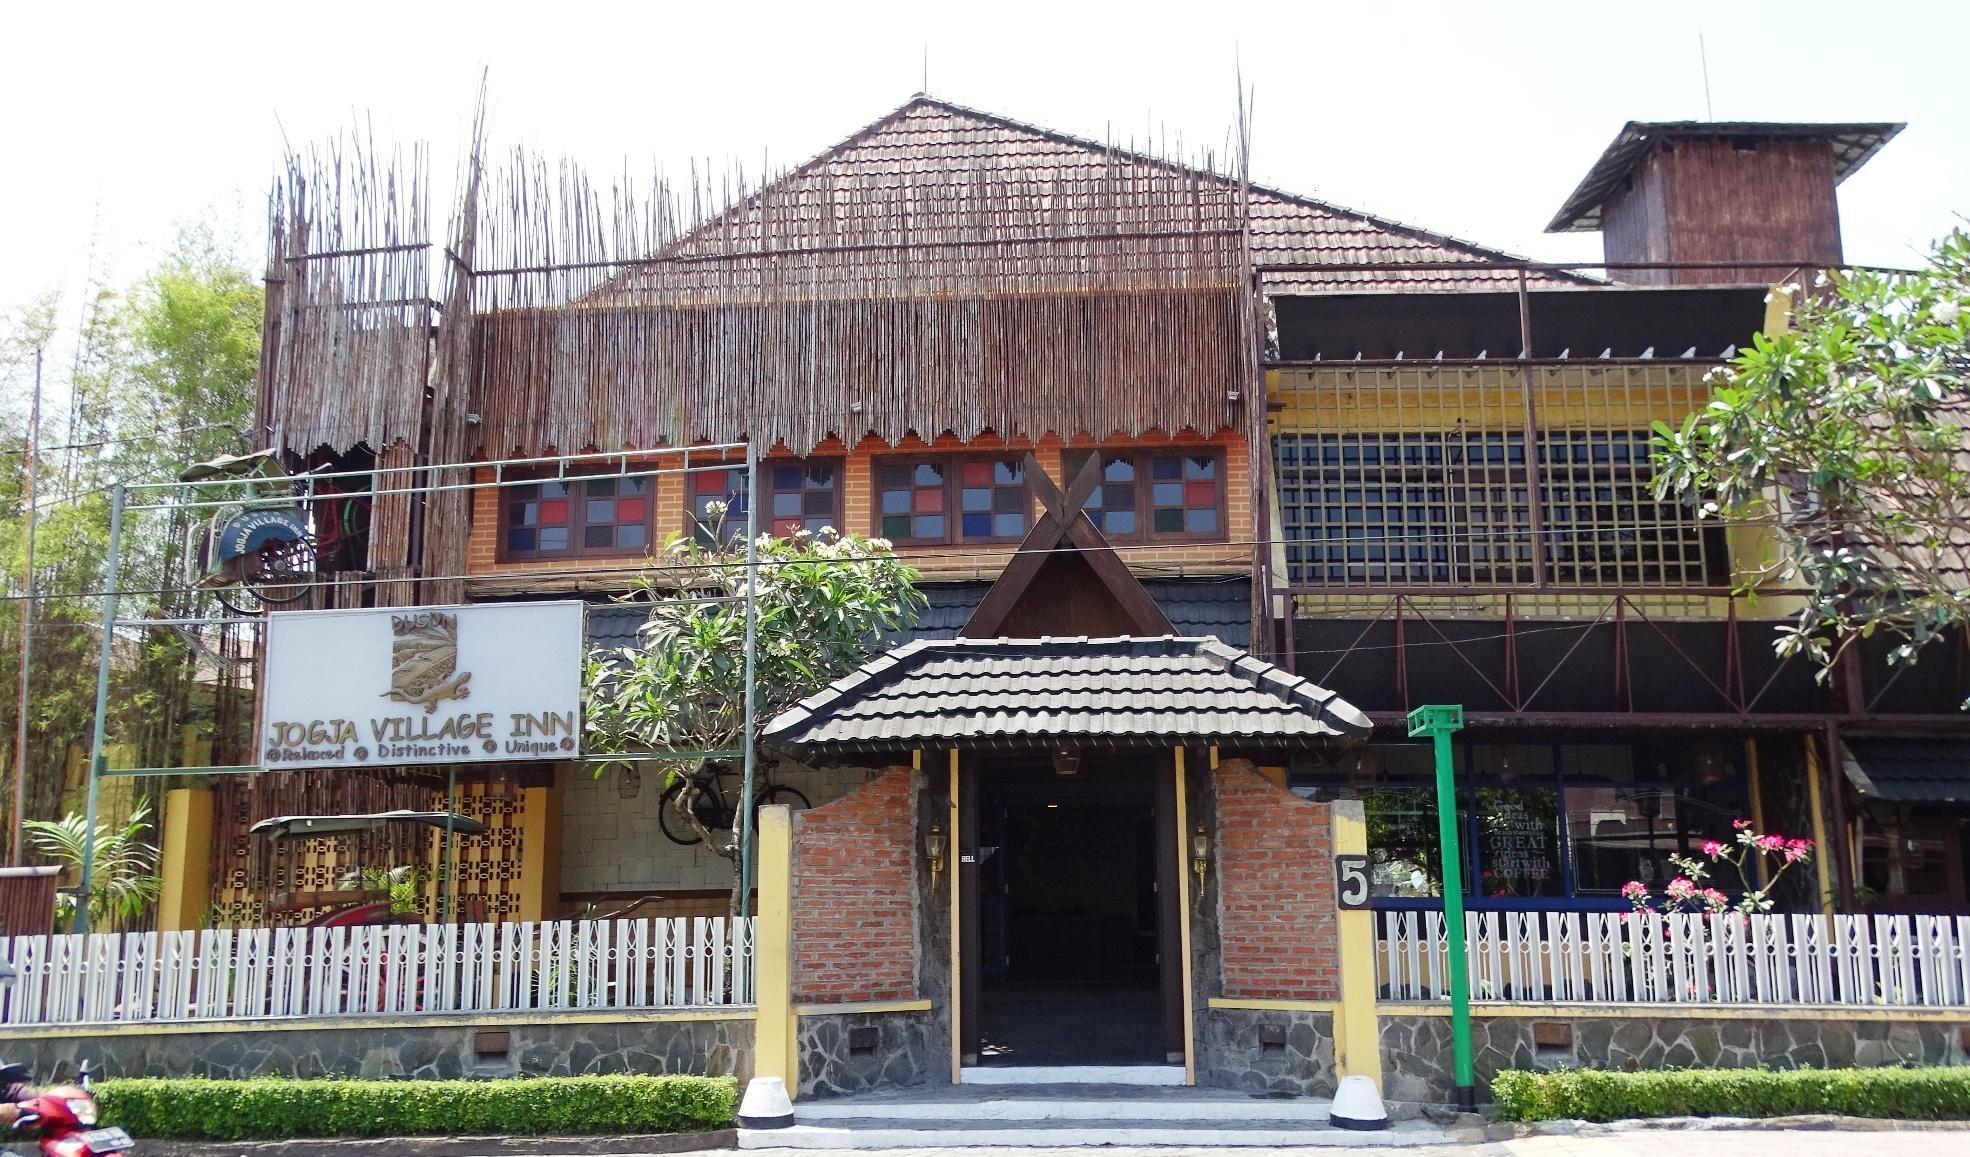 Dusun Yogya village Inn